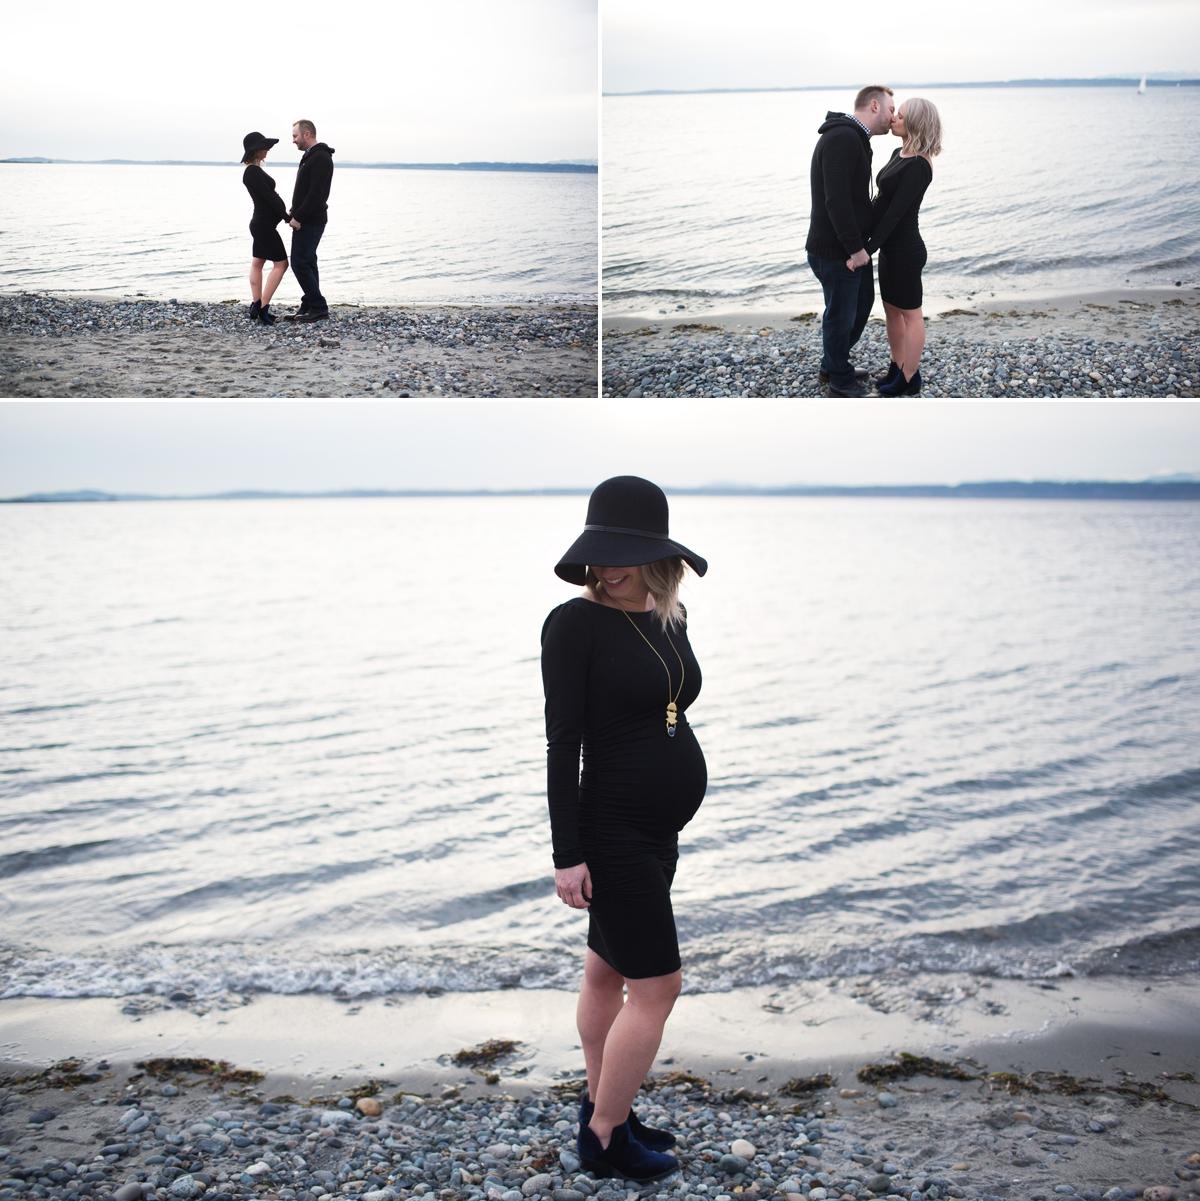 elena s blair seattle maternity photographer outdoor beach